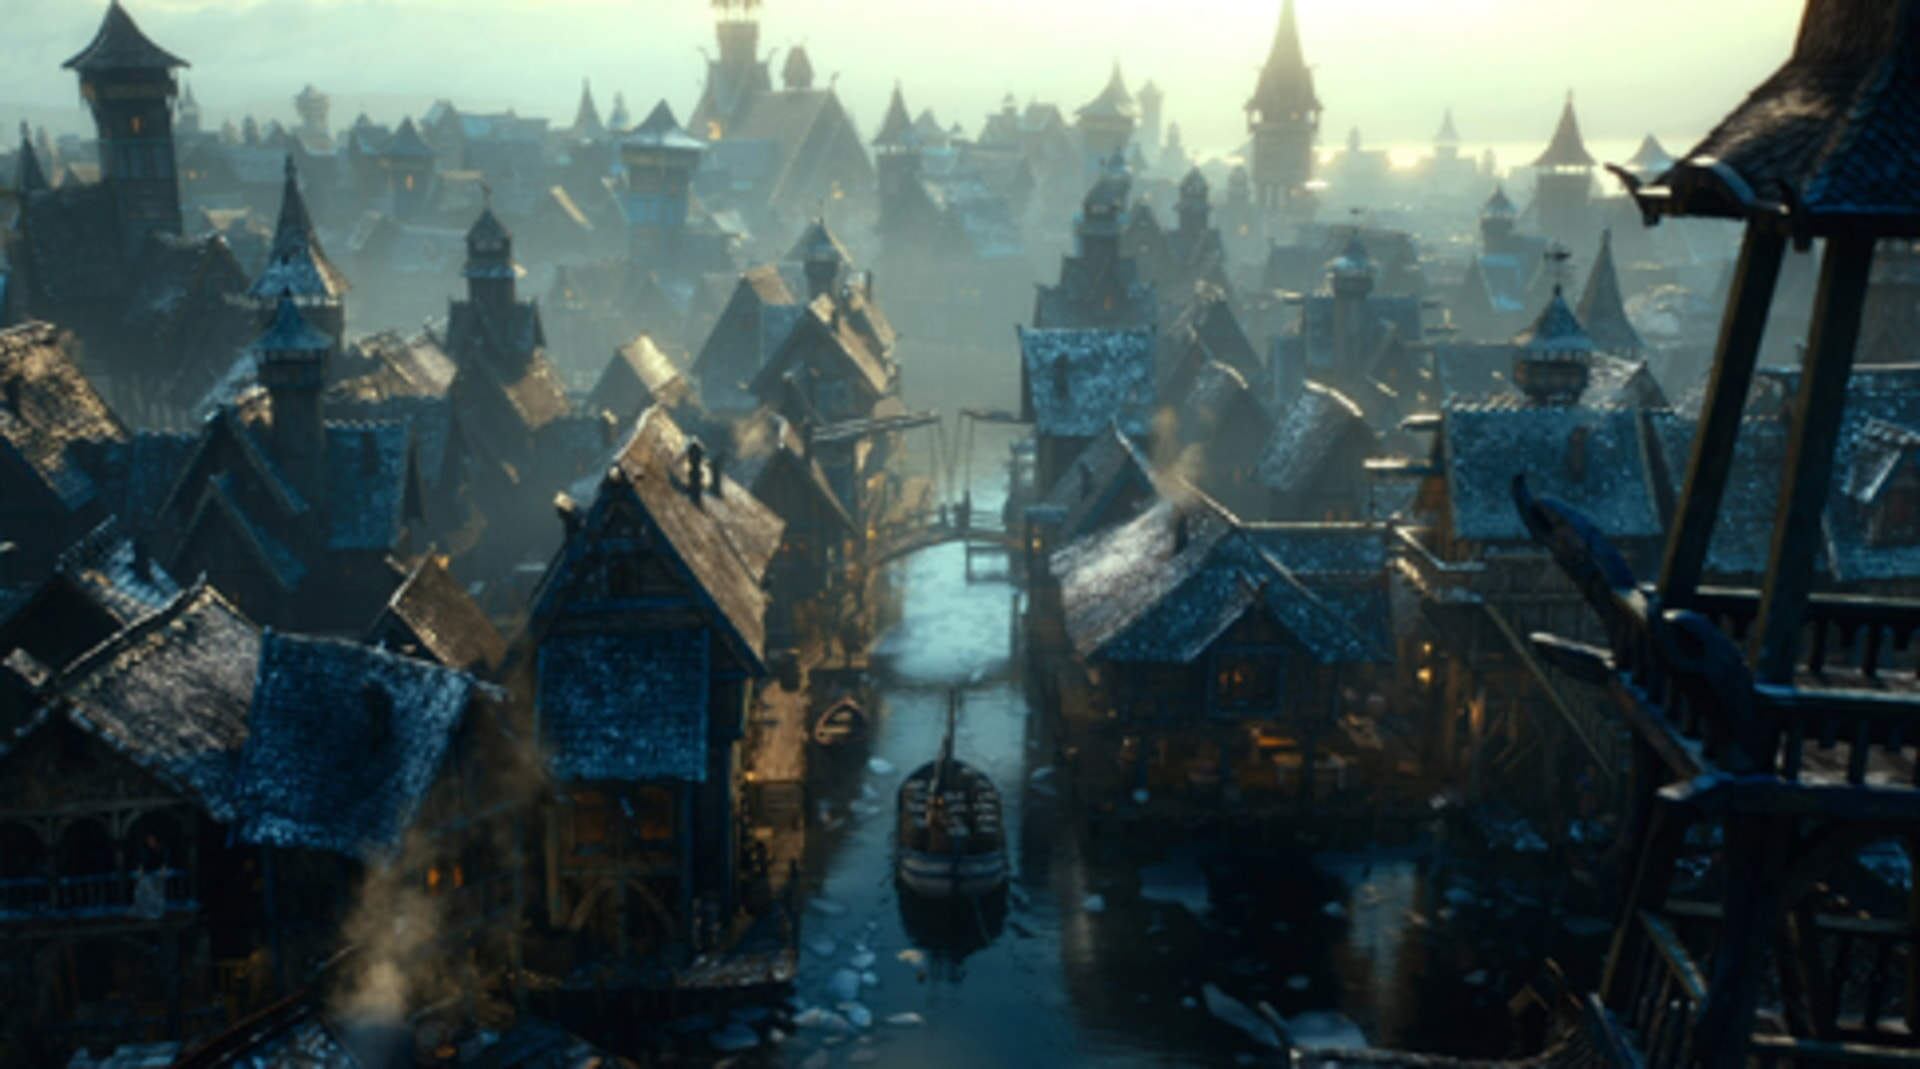 The Hobbit: The Desolation of Smaug - Image 33